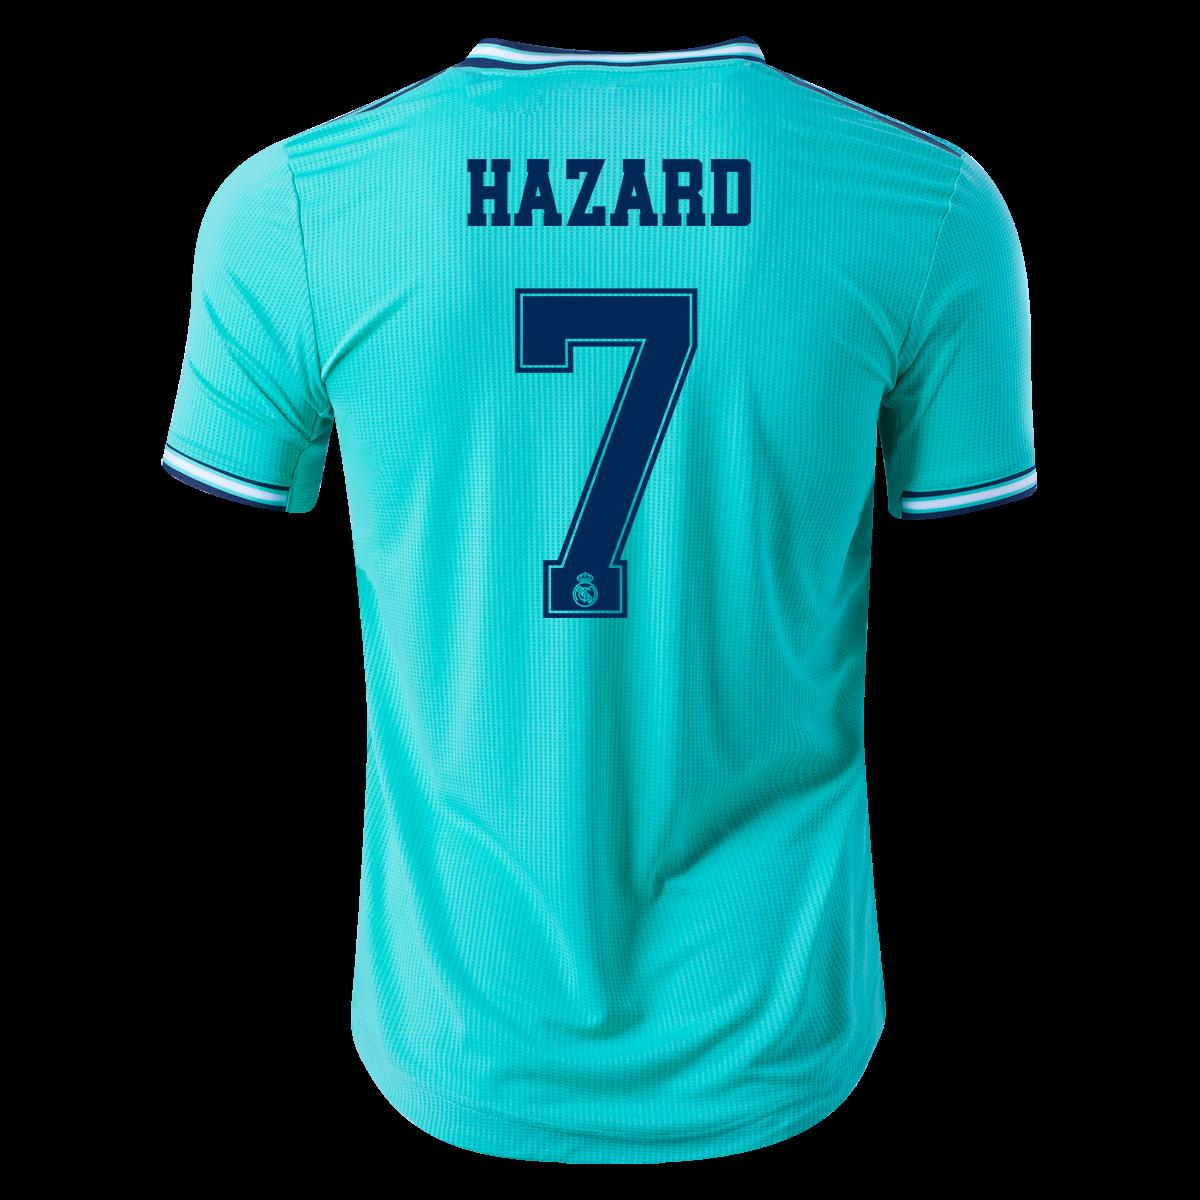 Adidas Eden Hazard Real Madrid Authentic Third Jersey 19 20 L Hazard Real Madrid Real Madrid Jersey